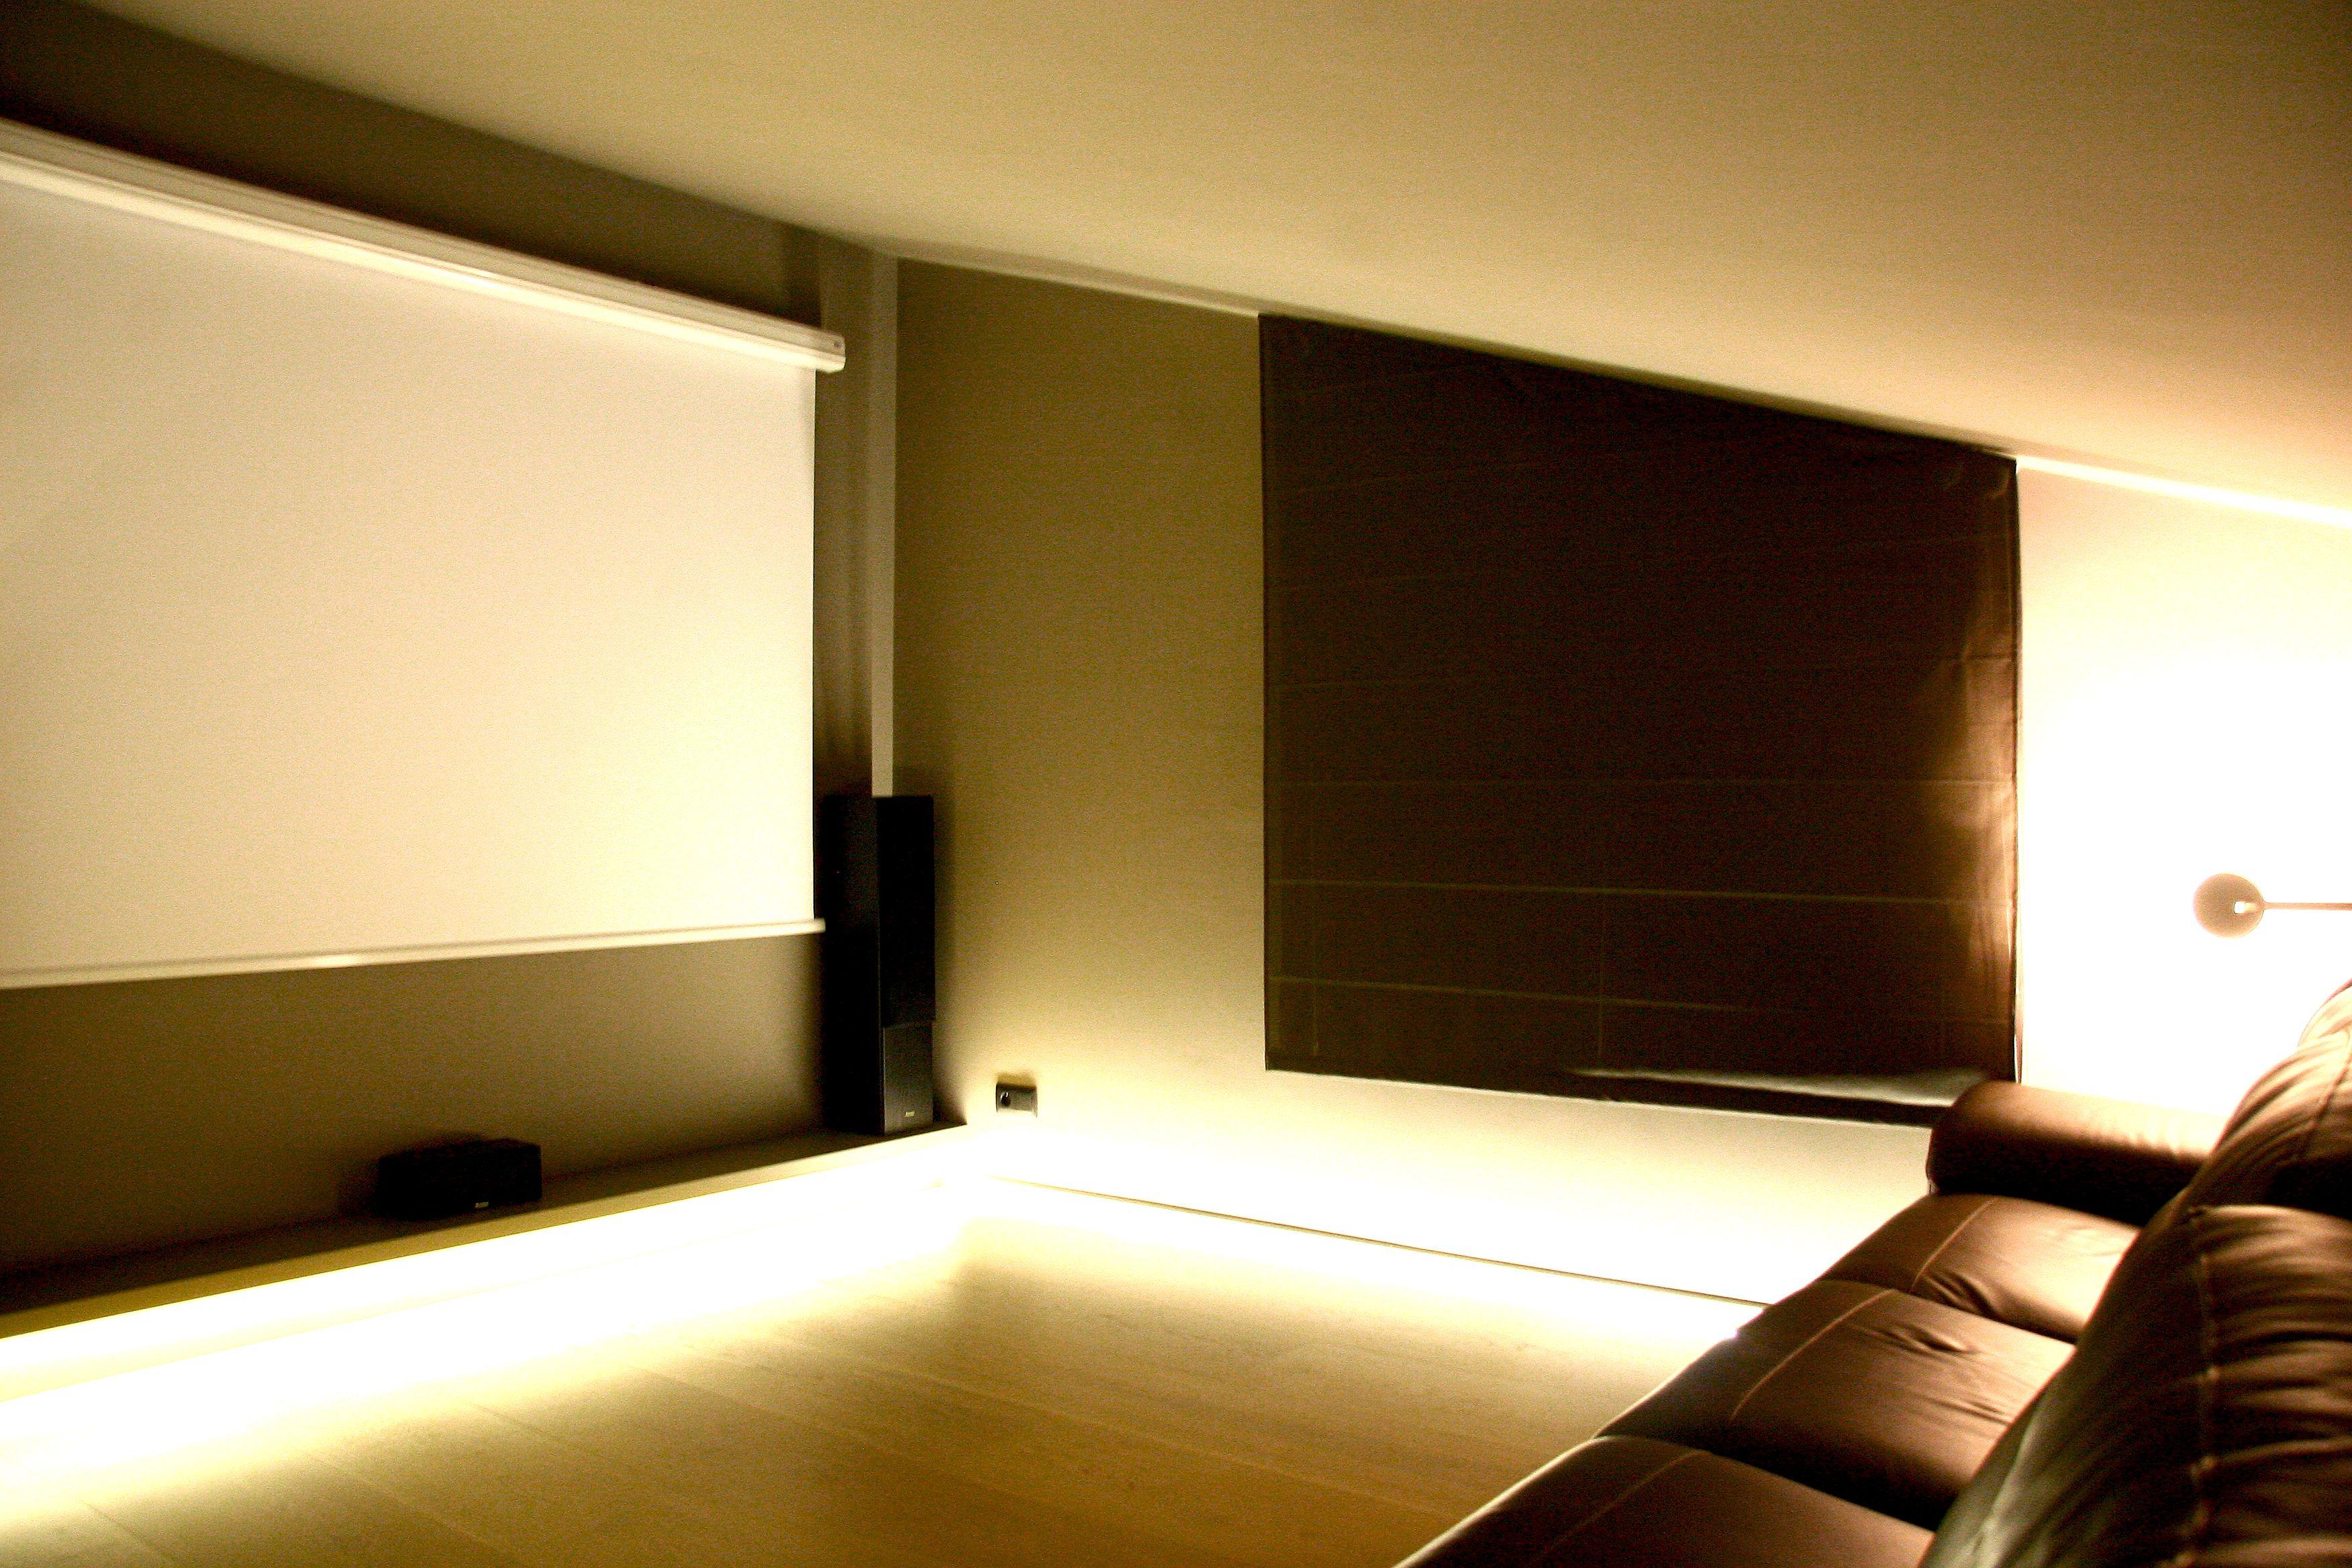 Rehabilitaci II Habitatge Sala De Cinema Illuminaci Jordi